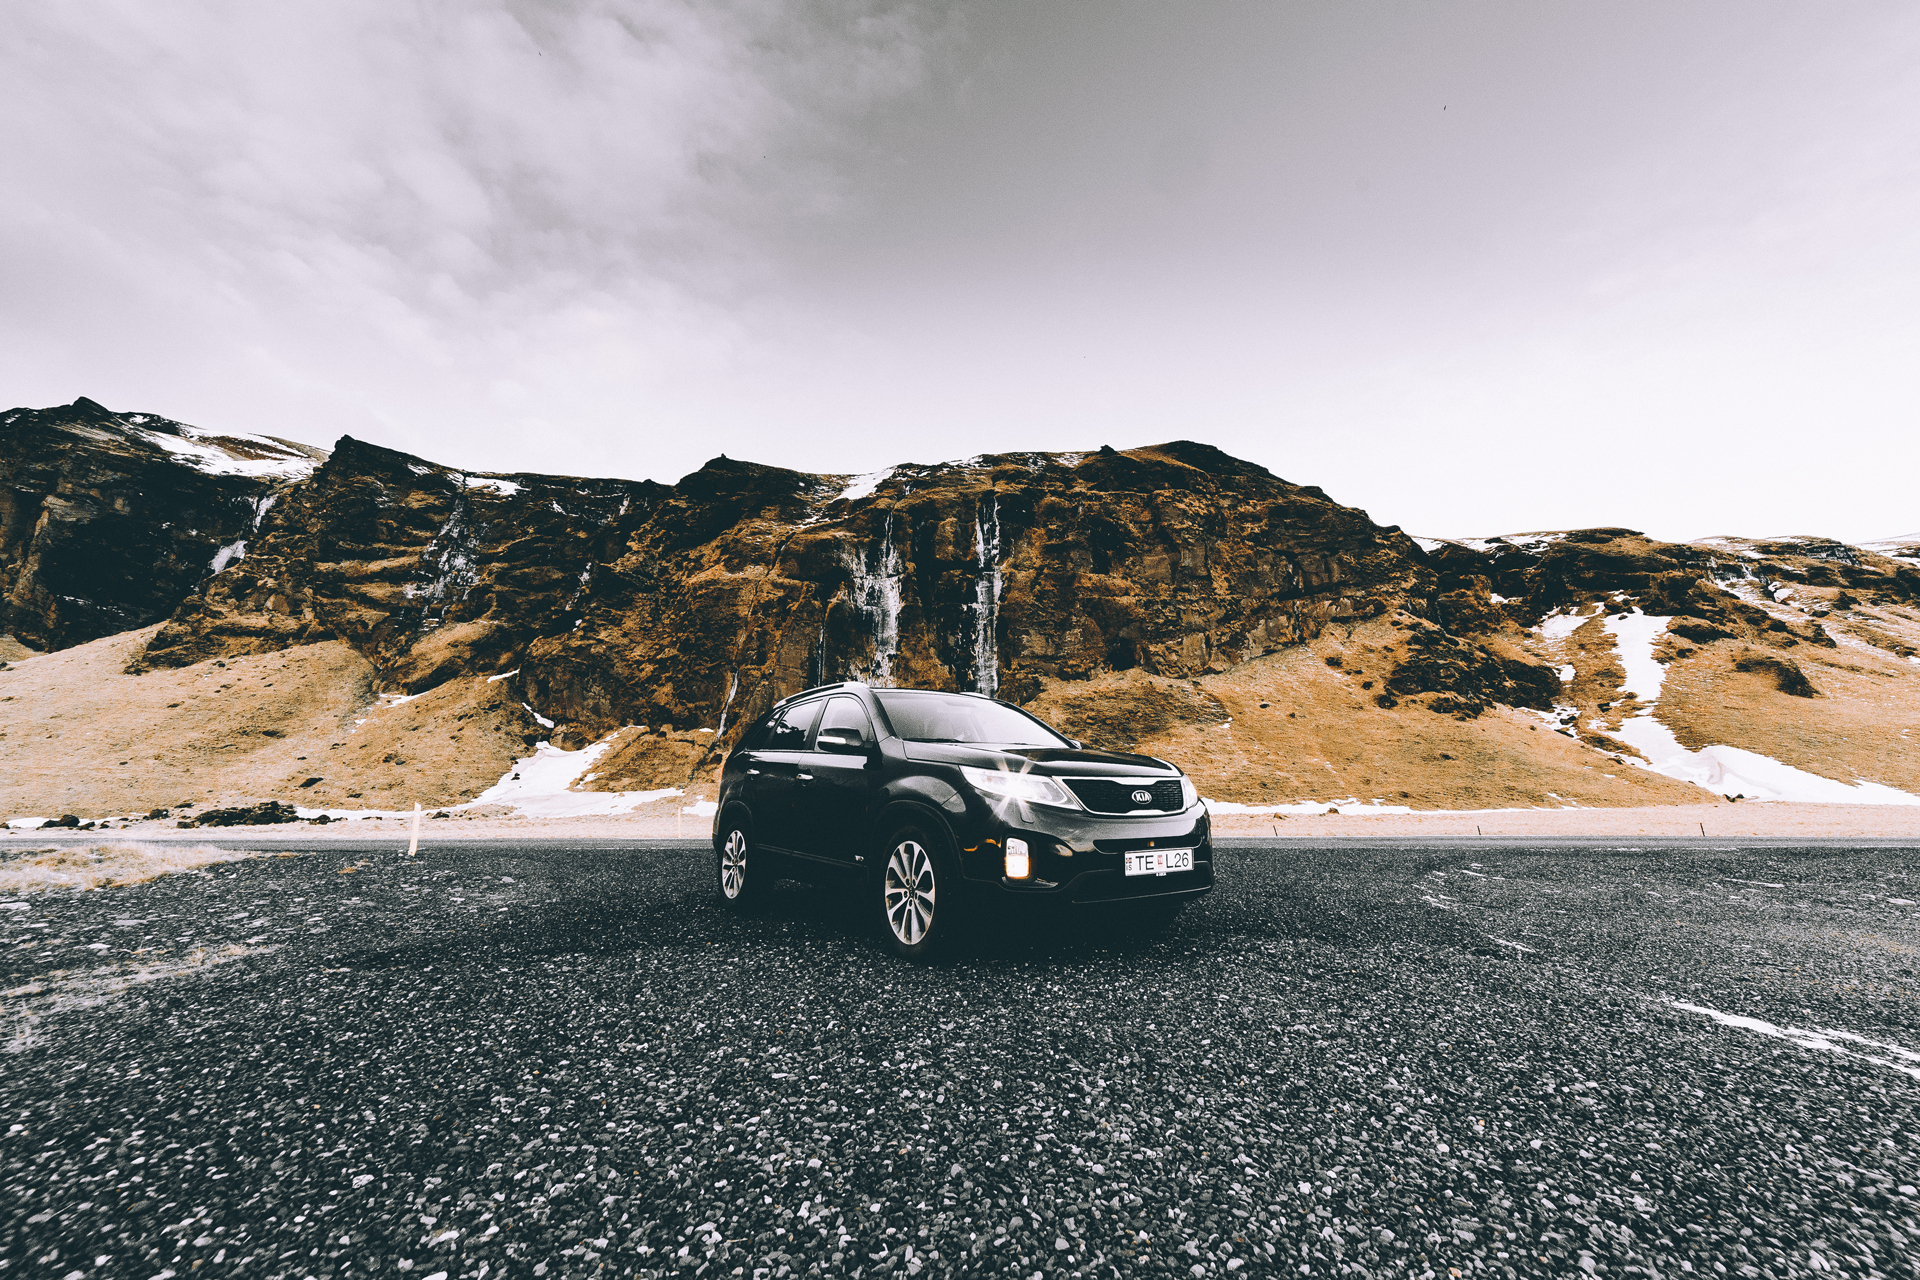 Avis + Kia - Travel Iceland Campaign